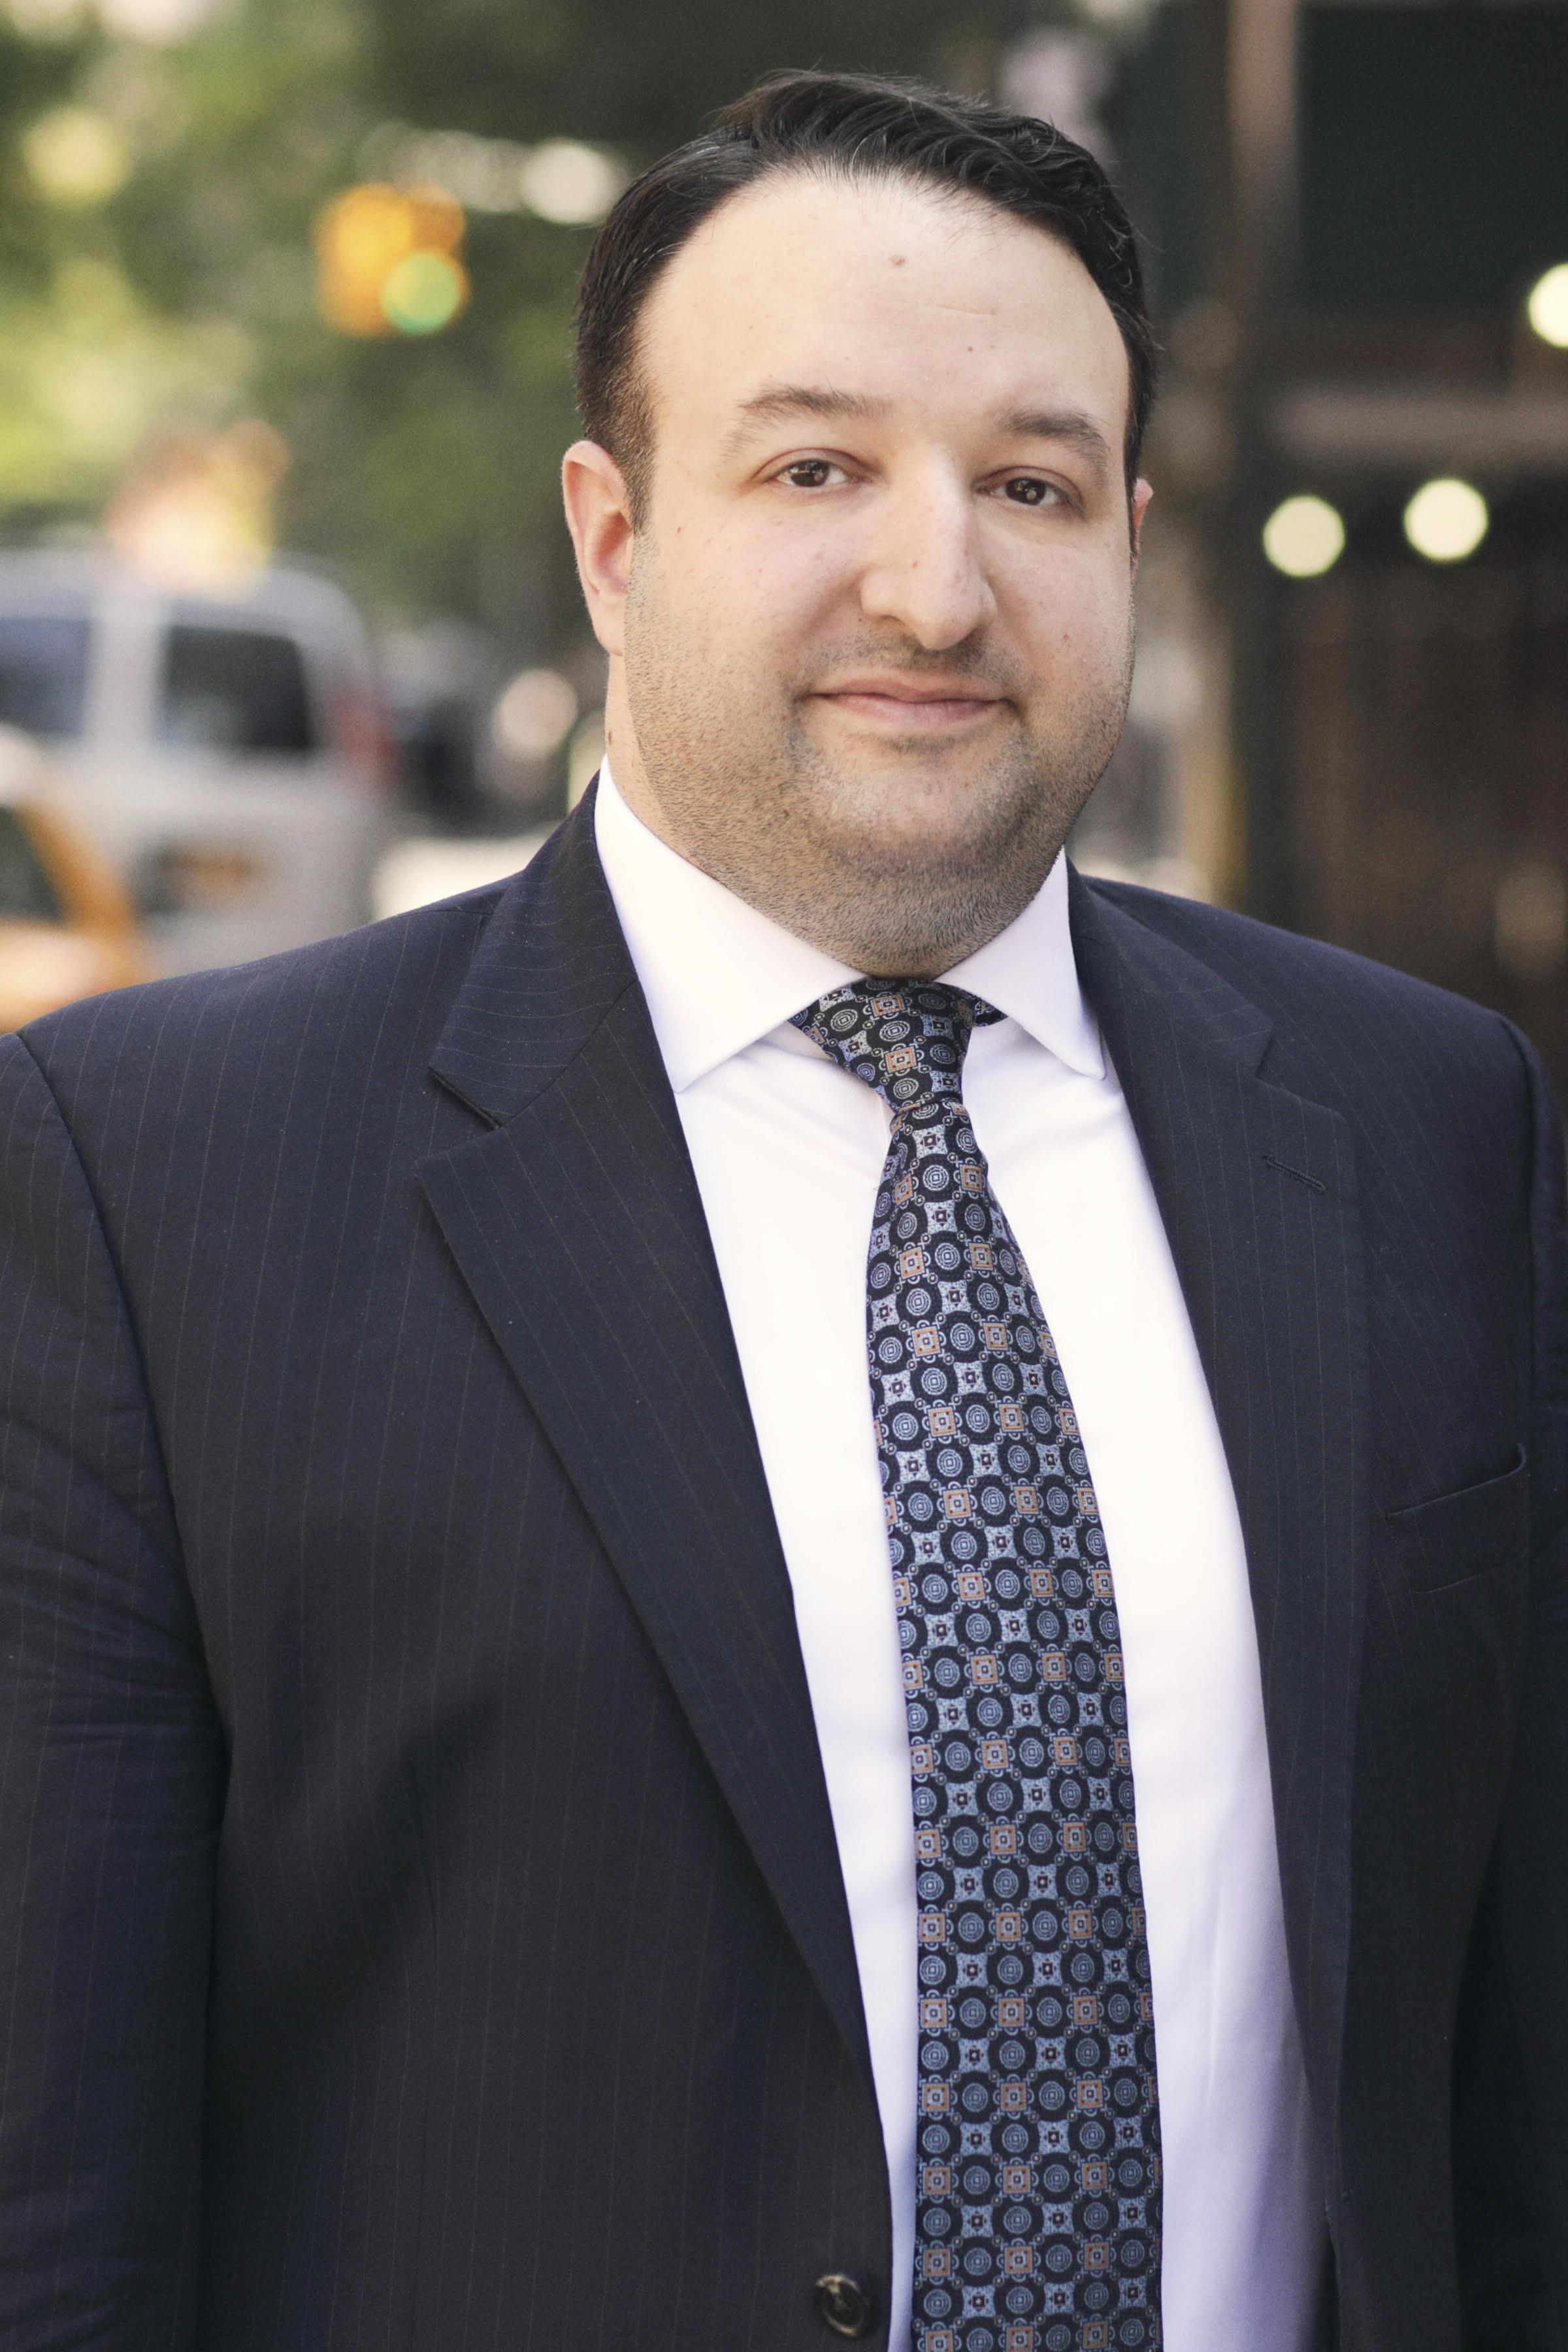 Joshua J. Greene  Senior Associate  joshua@schwartzlevine.com